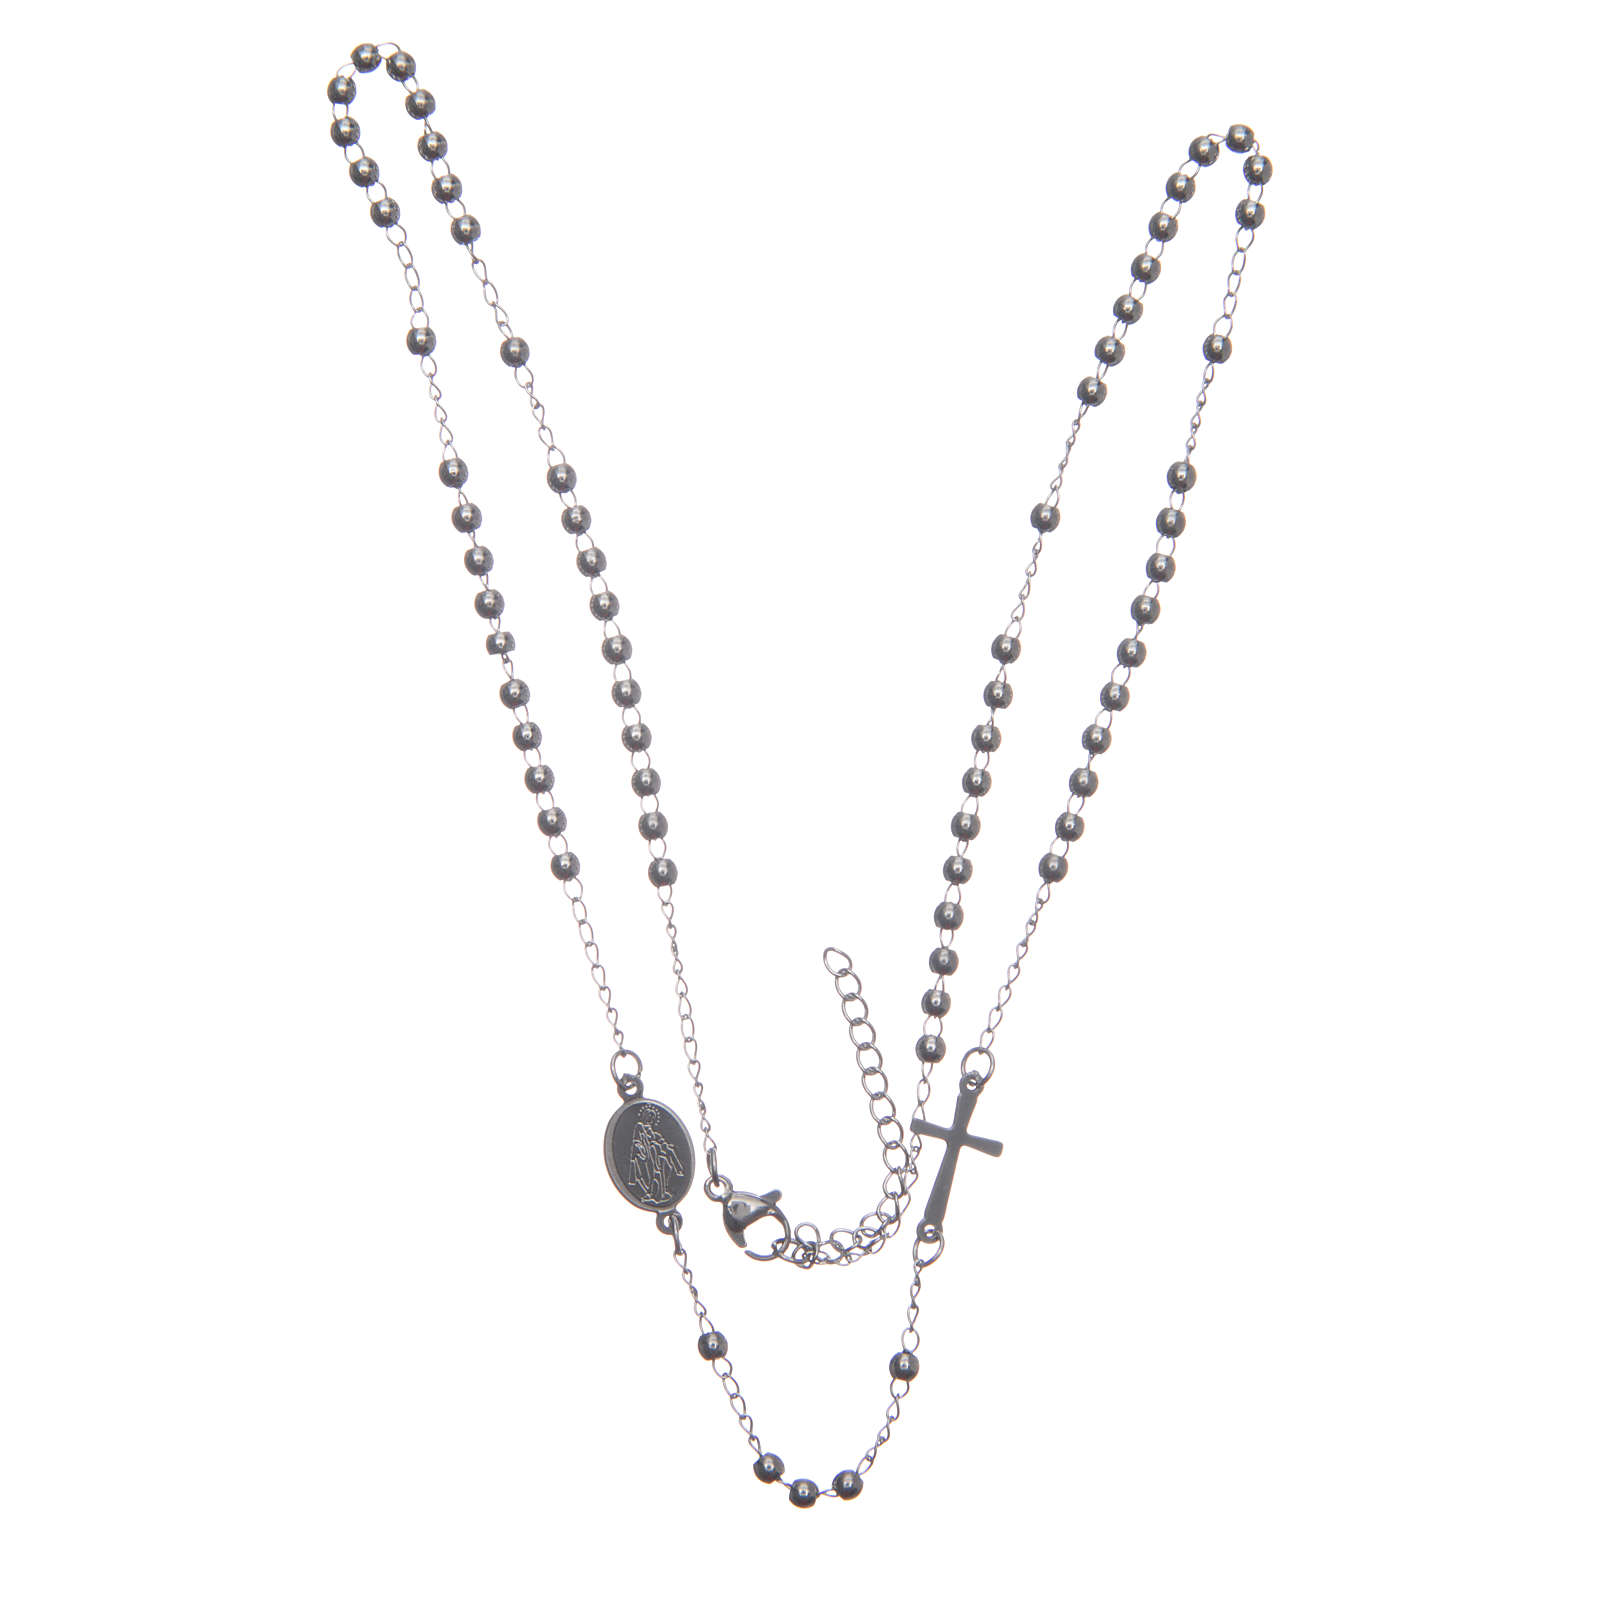 Rosario collar cuello redondo color plata de acero 316L 4